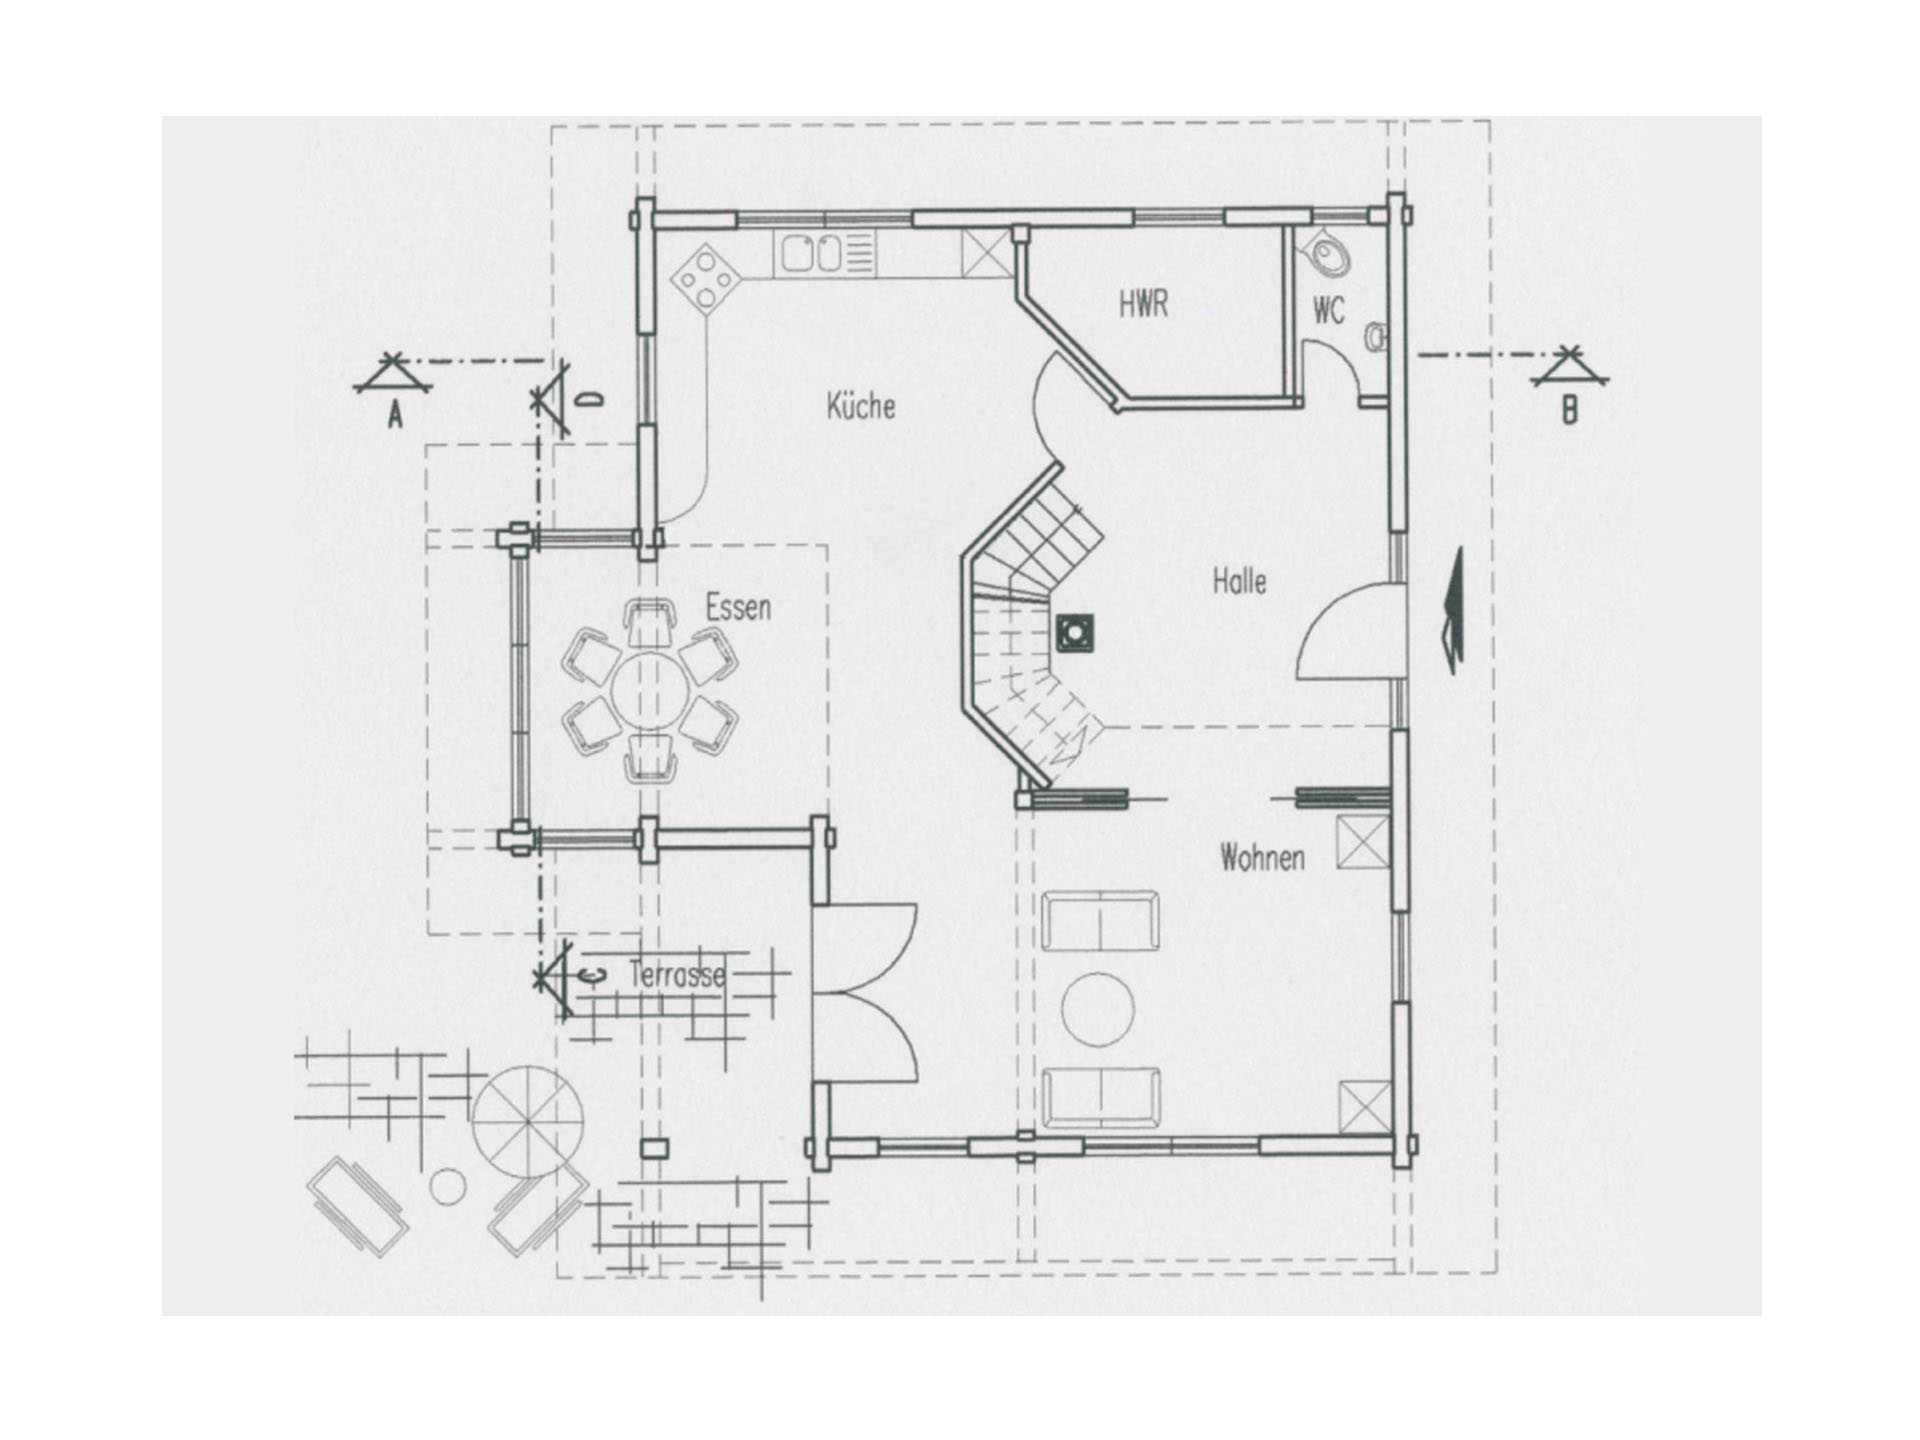 Holzhaus Hohenlohe - Fullwood Wohnblockhaus | Musterhaus.net